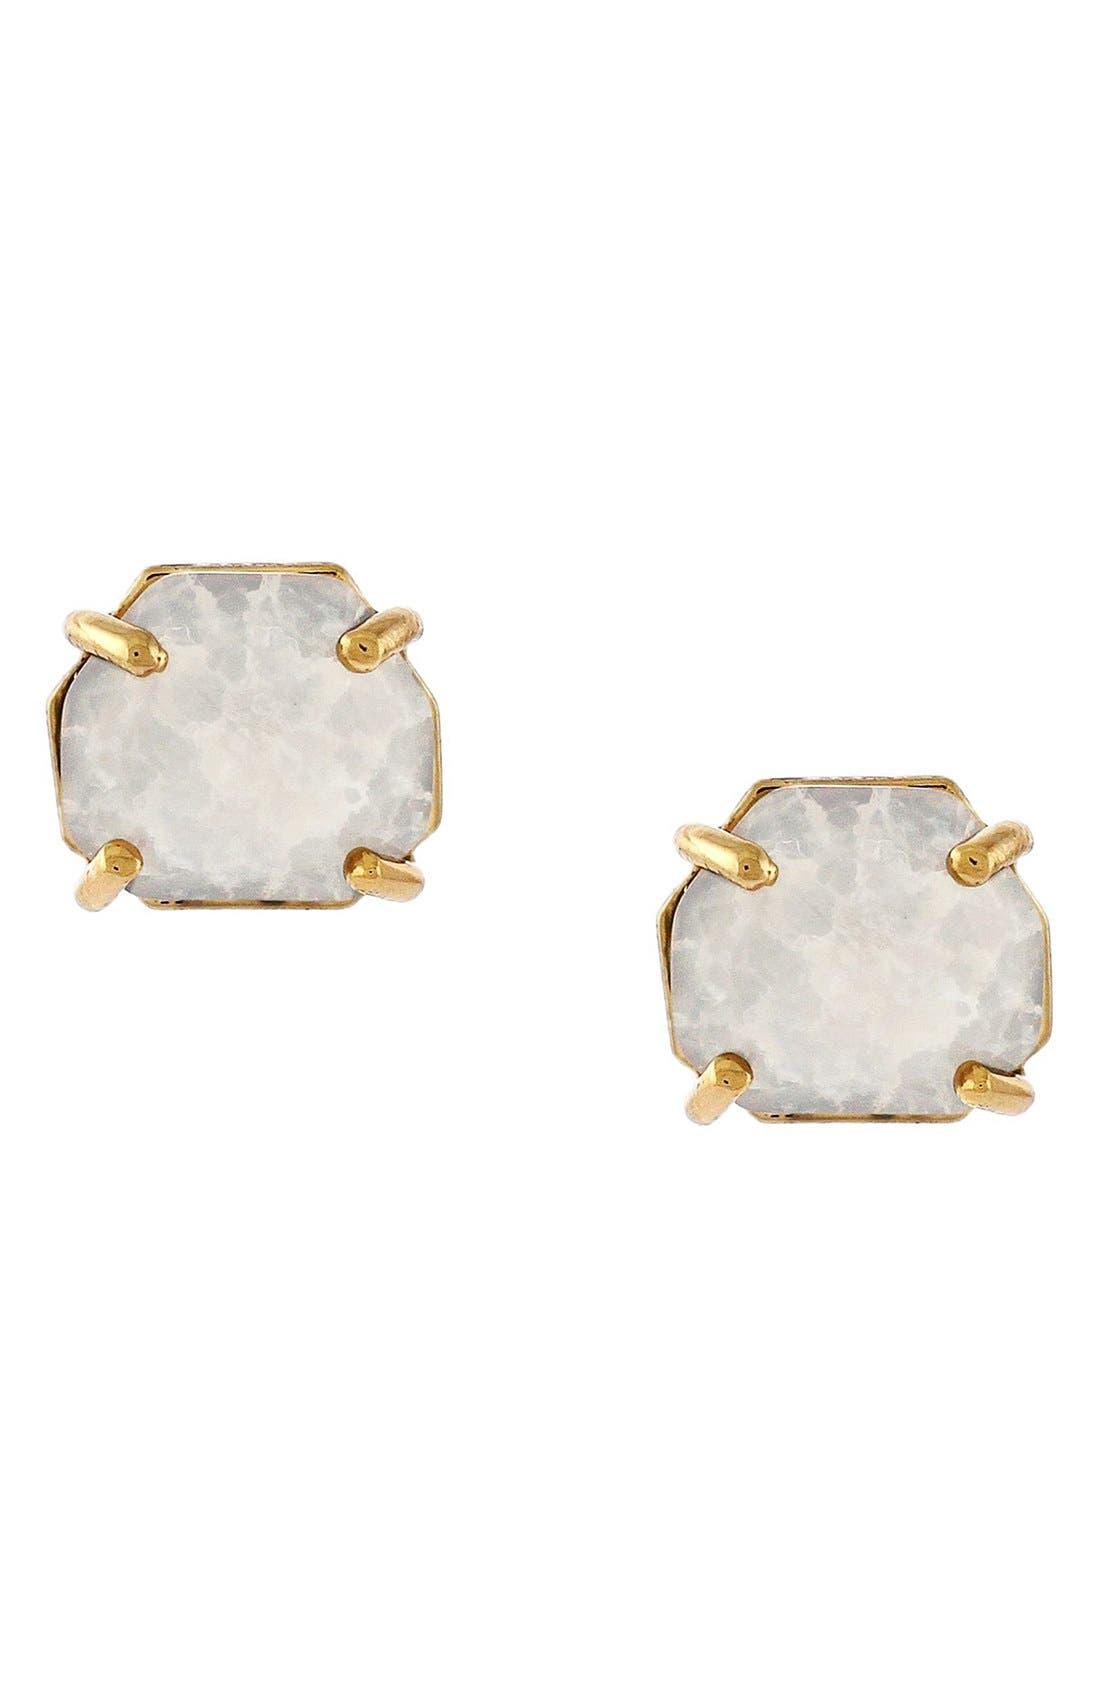 Main Image - Vince Camuto Crystal Stud Earrings